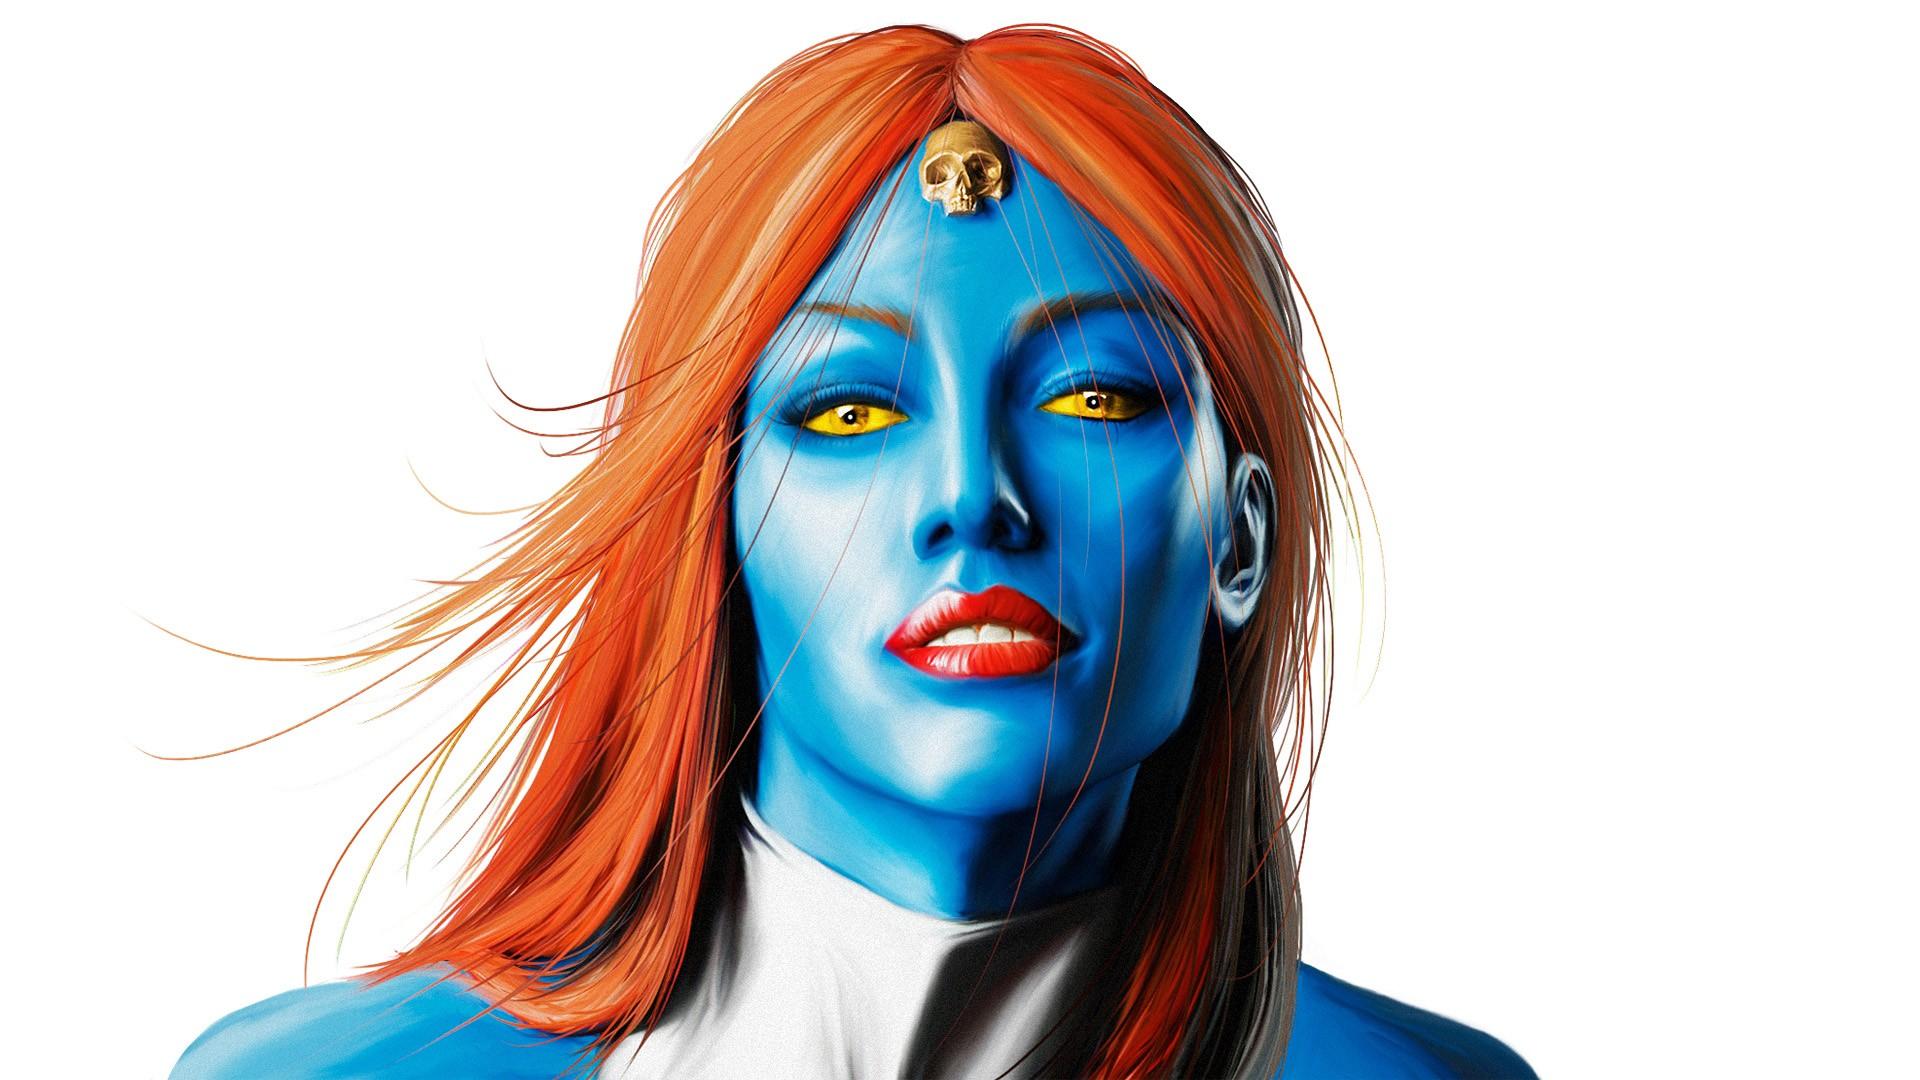 Wonderful Wallpaper Marvel Face - face-illustration-blue-cartoon-Marvel-Comics-hair-Mystique-clothing-head-ART-woman-costume-572773  Collection_457874.jpg